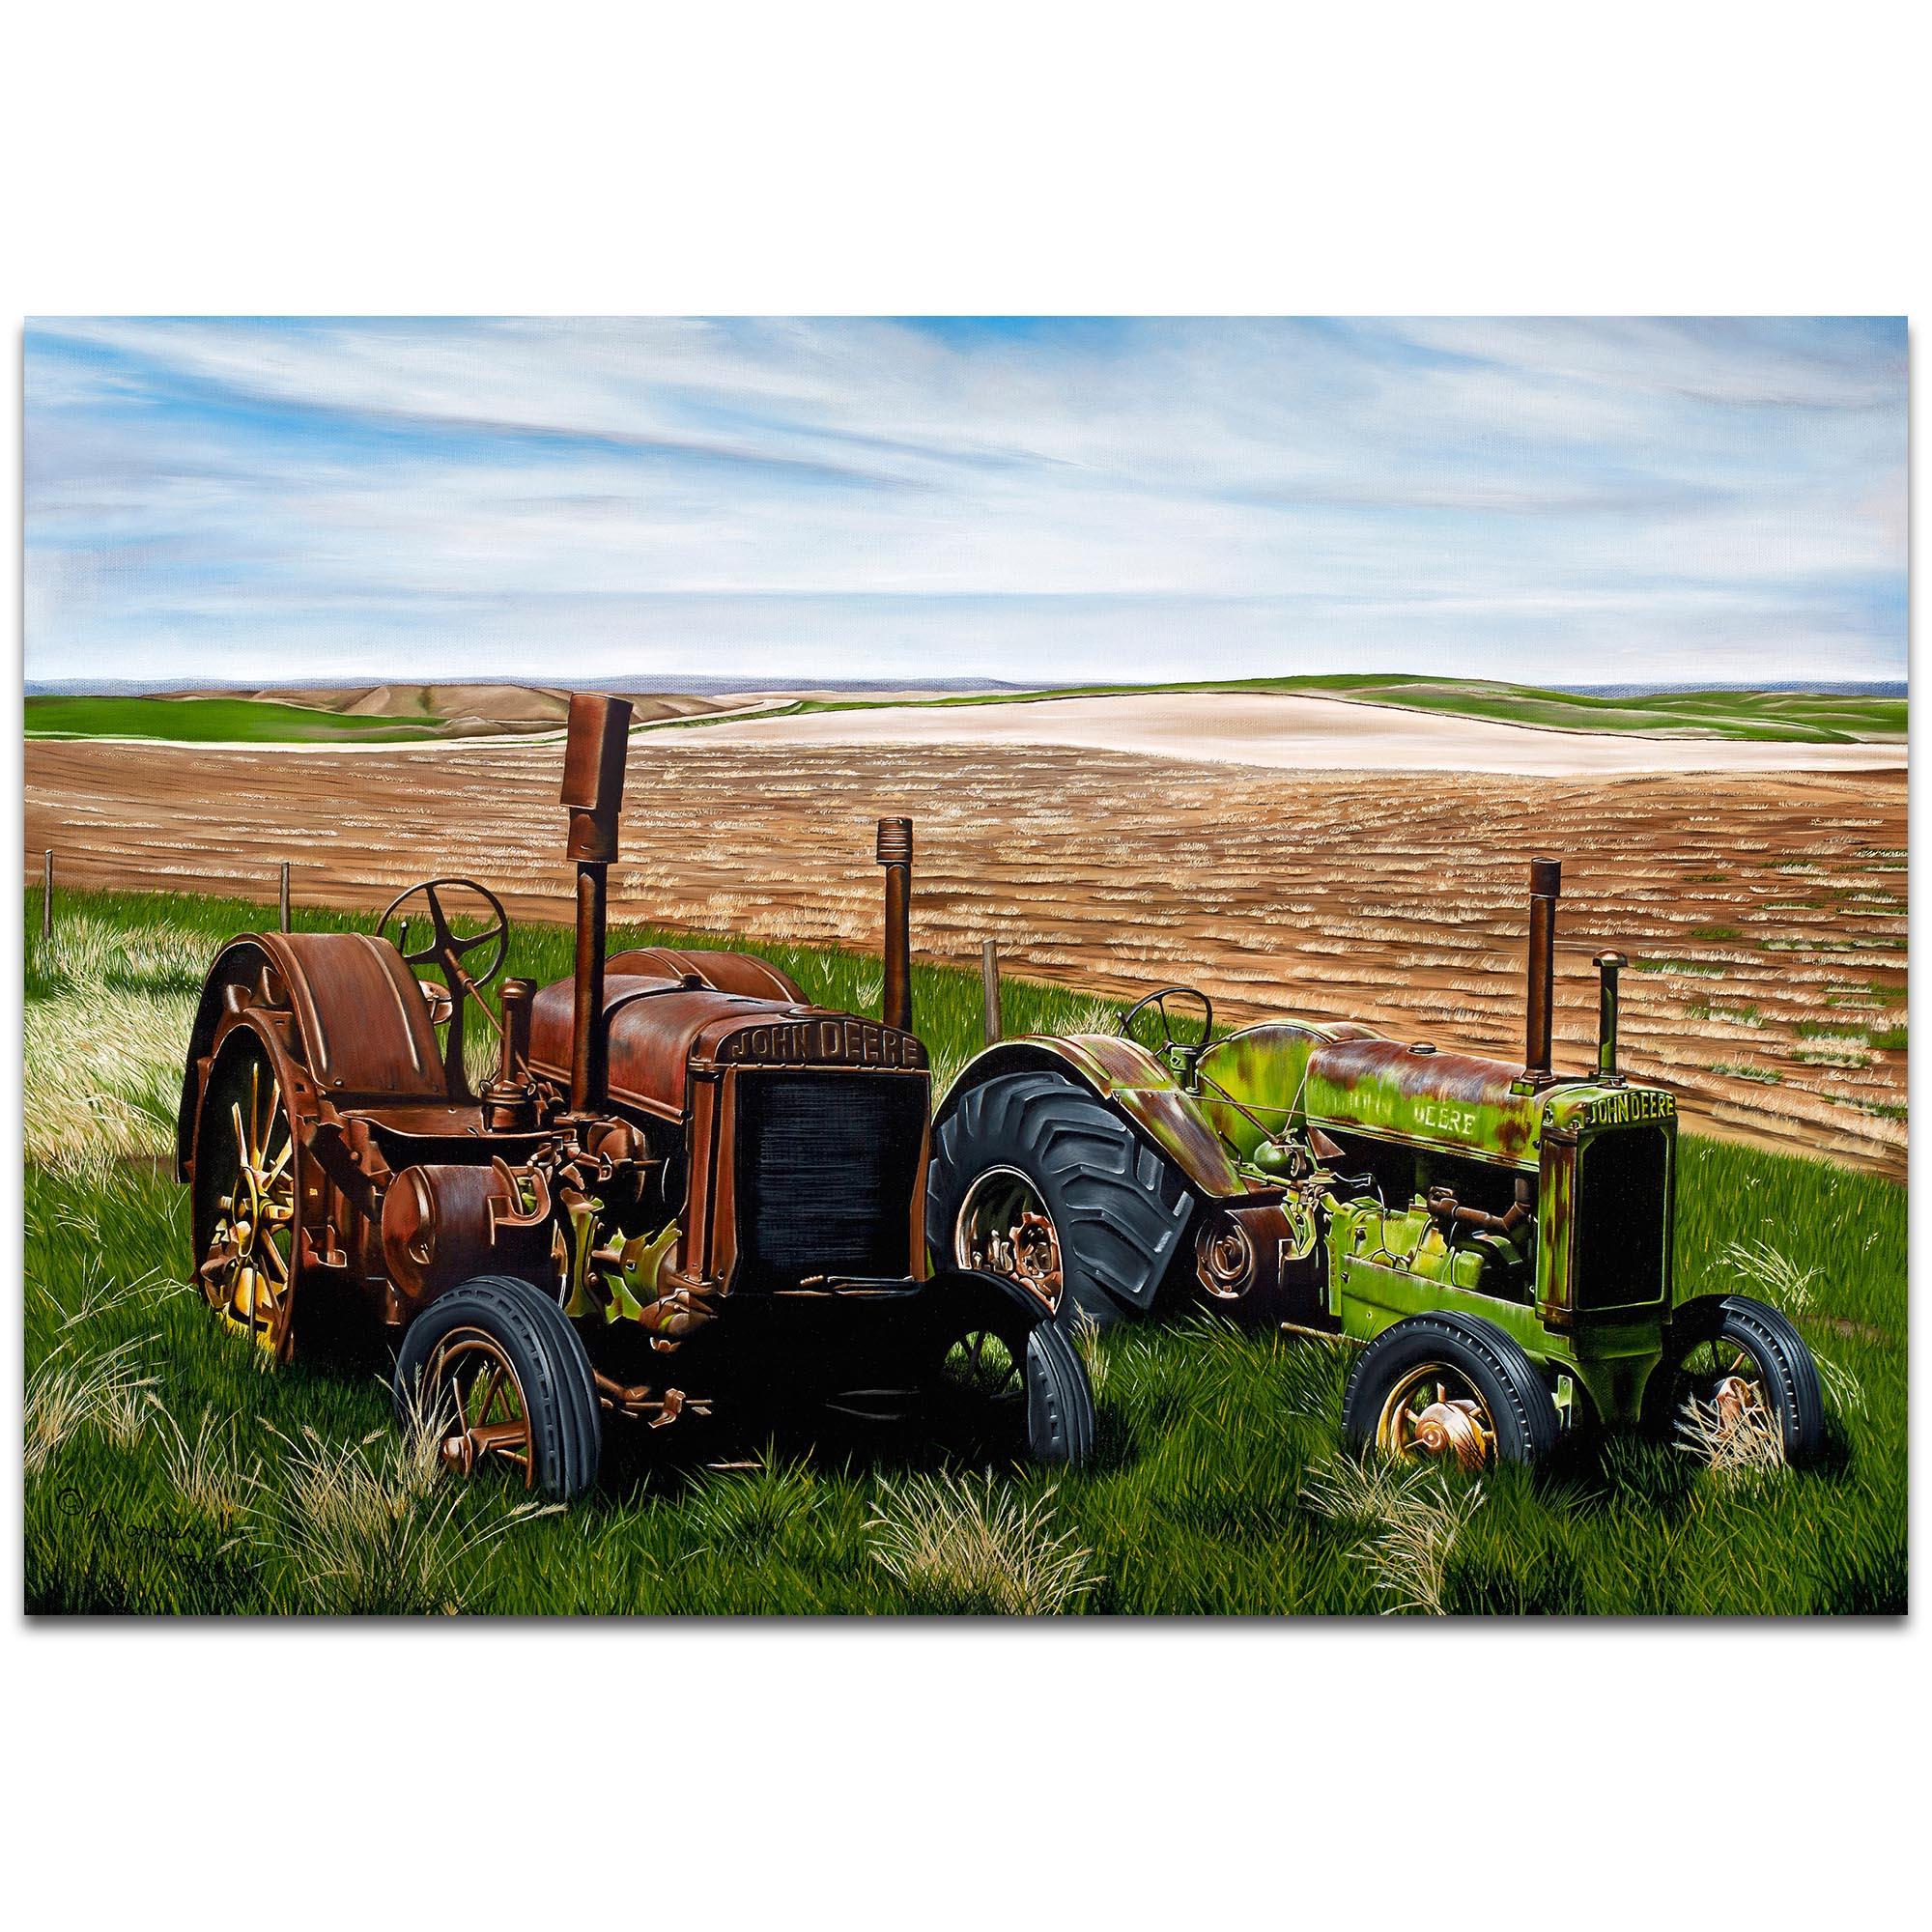 Americana Wall Art 'Two John Boys' - Classic Tractor Decor on Metal or Plexiglass